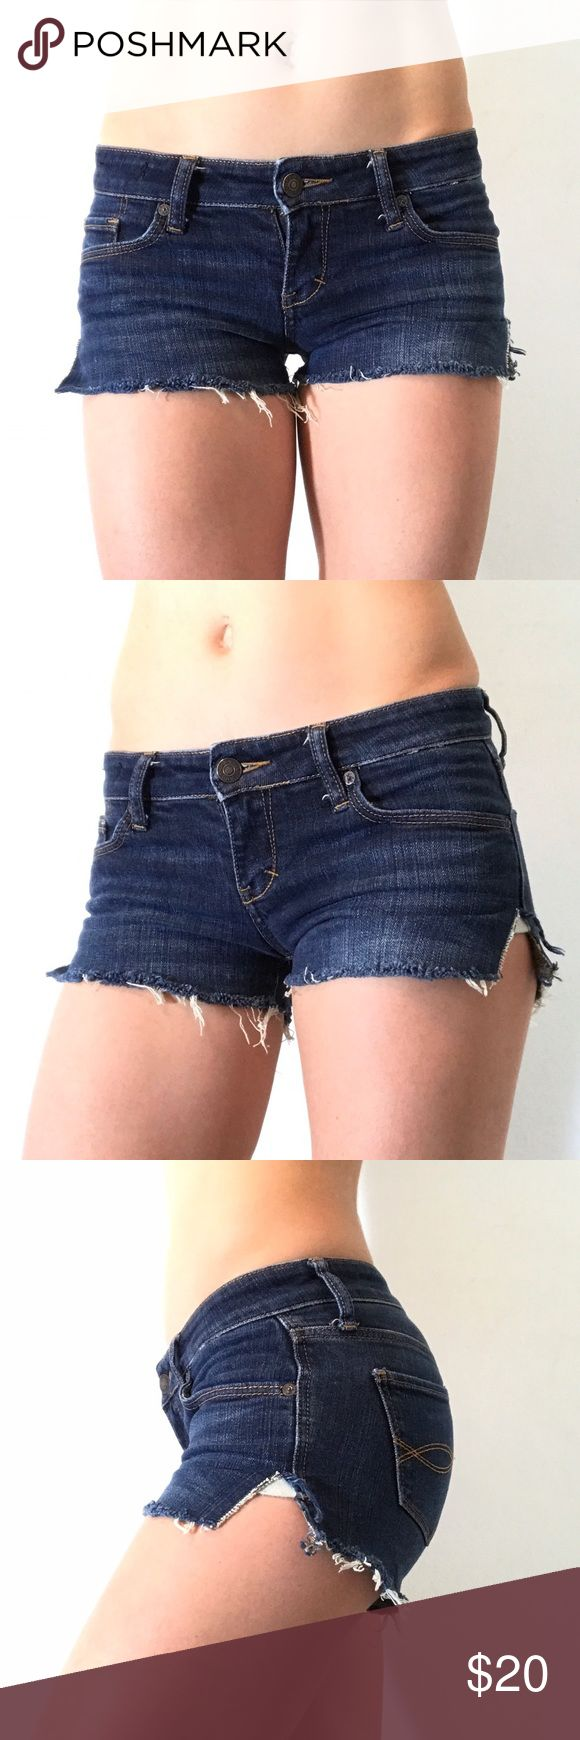 Abercrombie distressed denim cutoff jean shorts 24 Abercrombie shorts Abercrombie & Fitch Shorts Jean Shorts